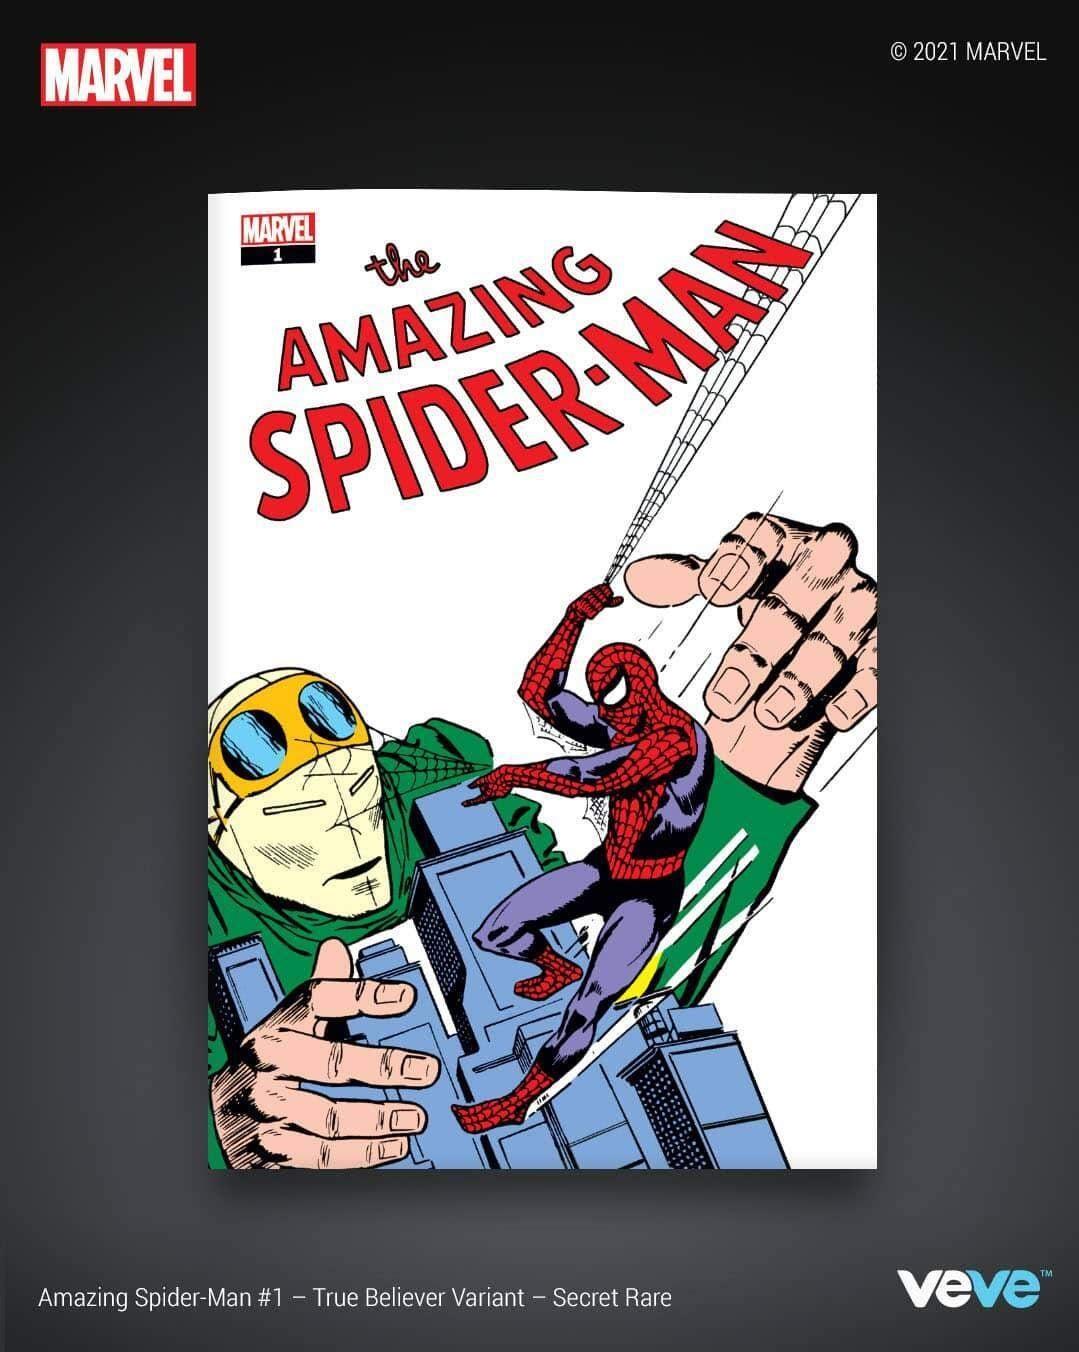 cmc-marvel-amazing-spider-man-01-secretrare-4_5